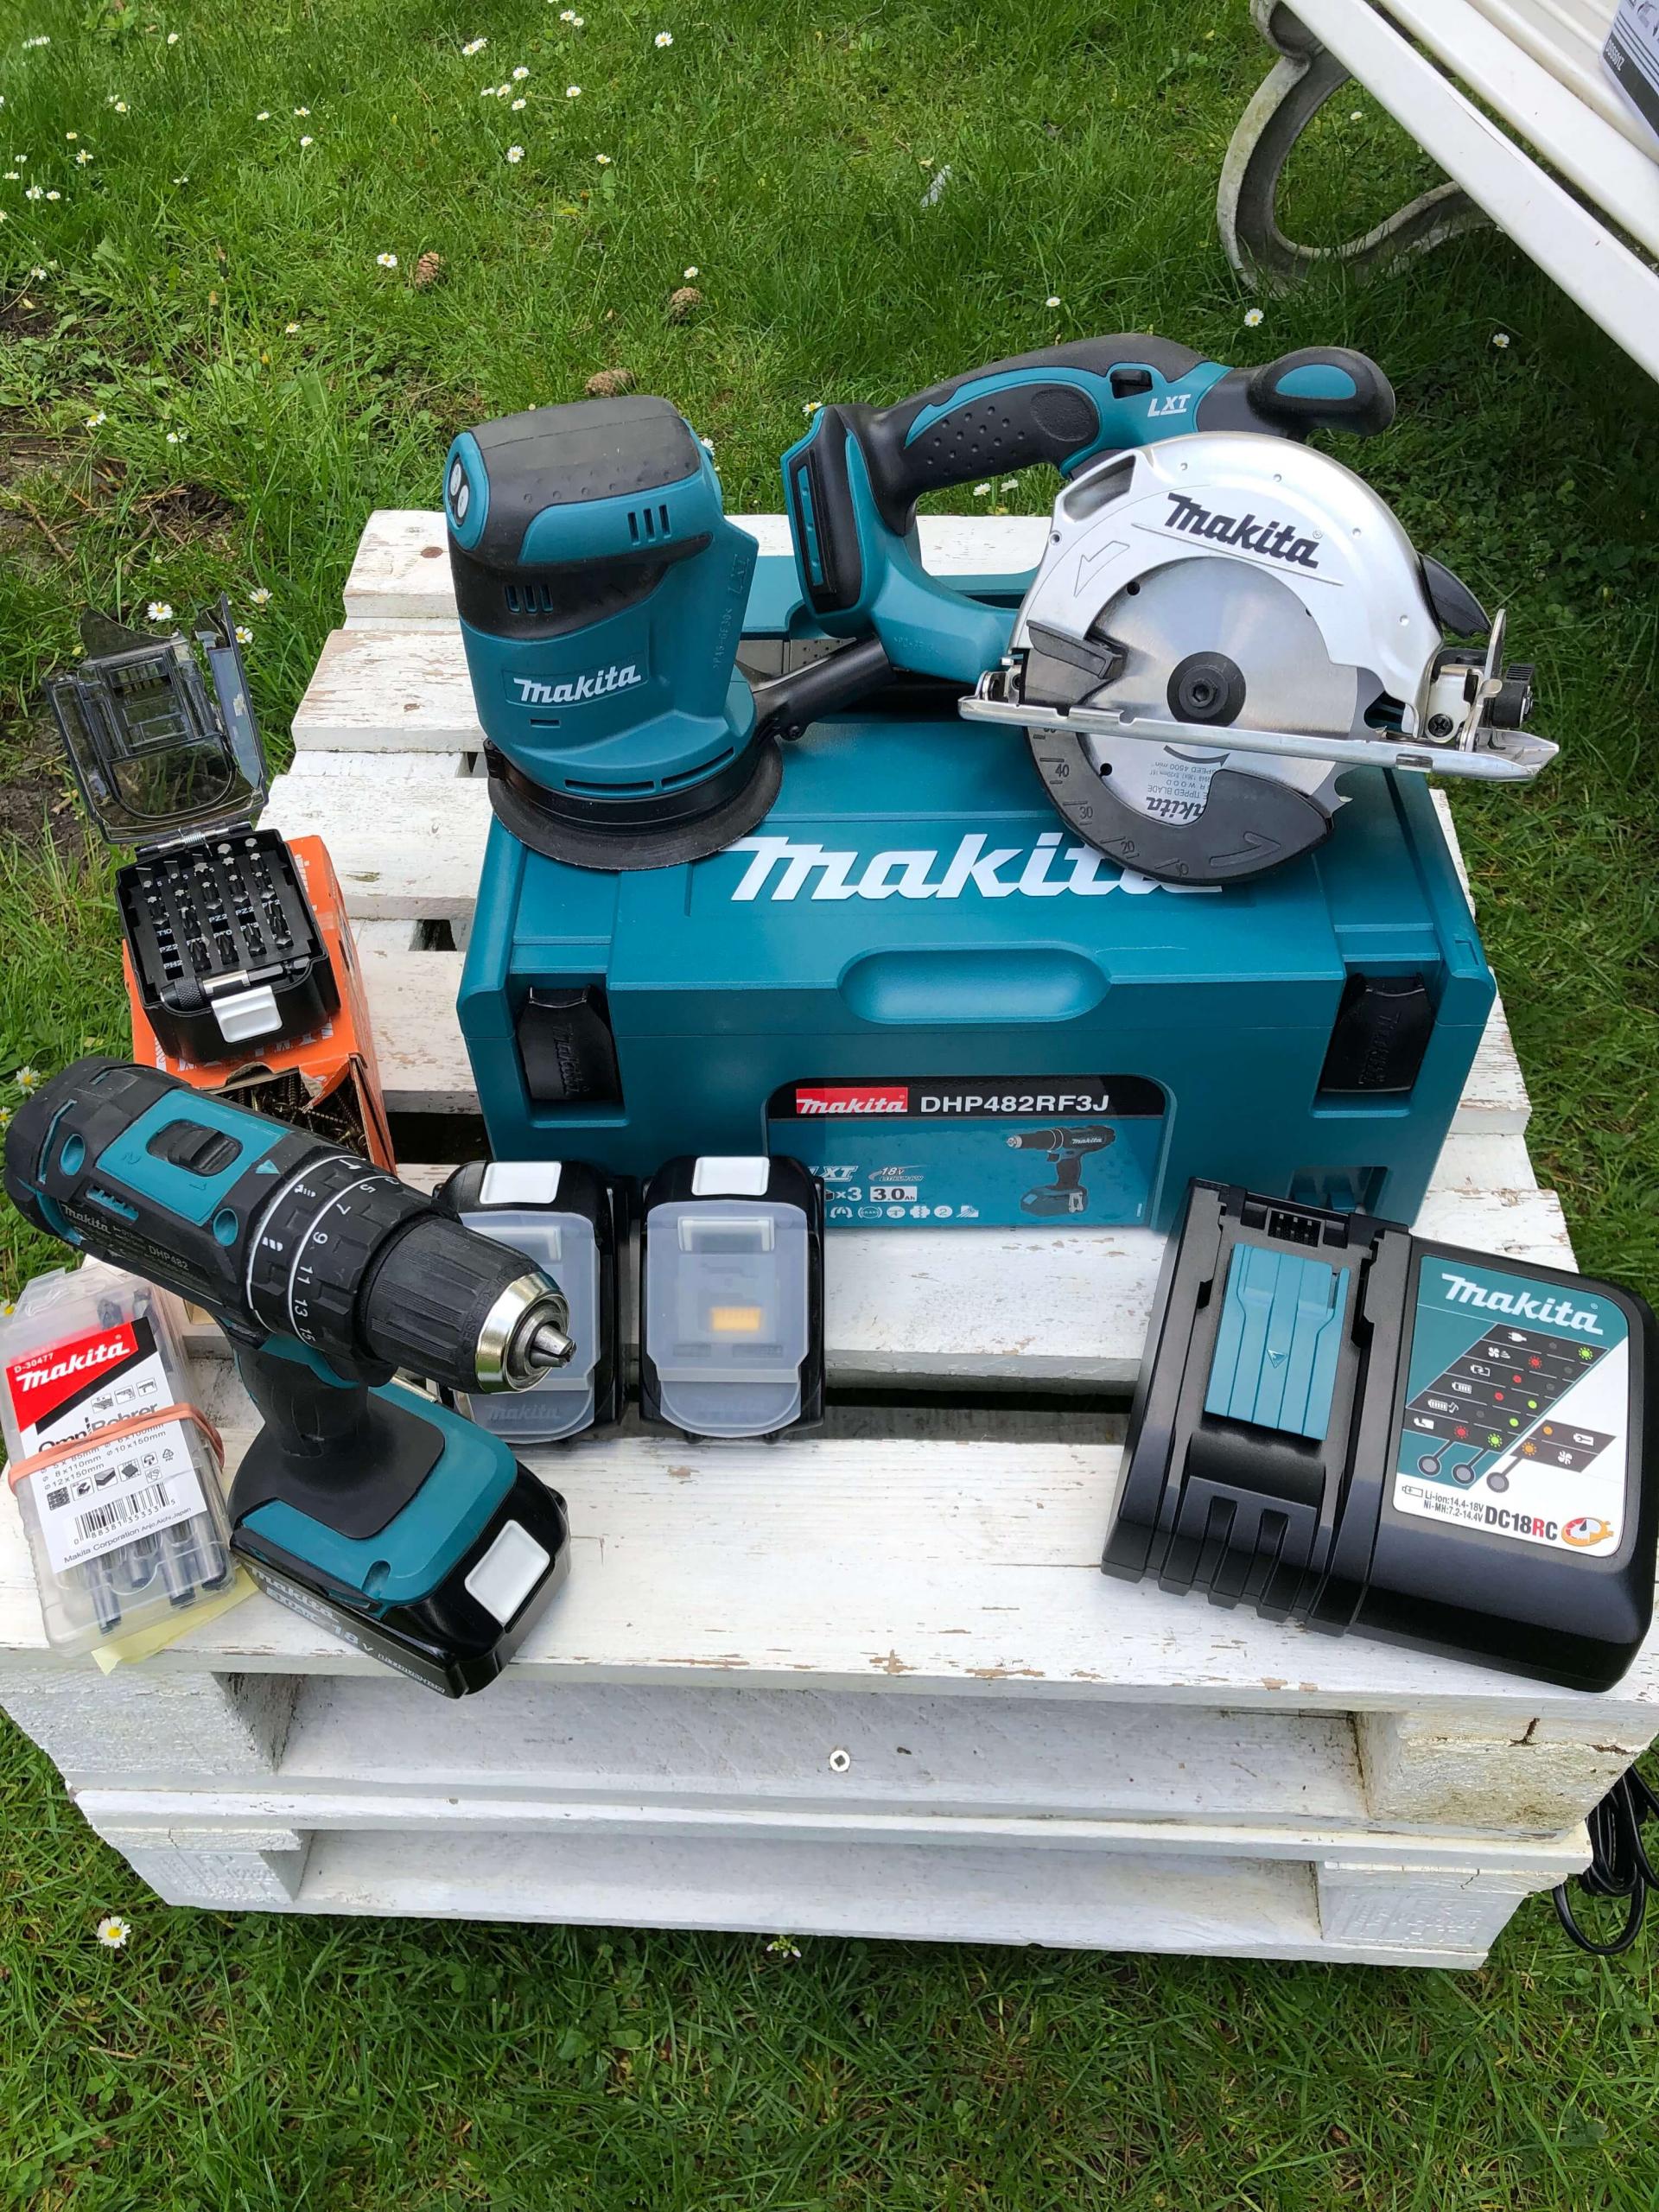 IMG_3571-scaled Produkttest: Makita Akku-Handkreissäge DSS501Z